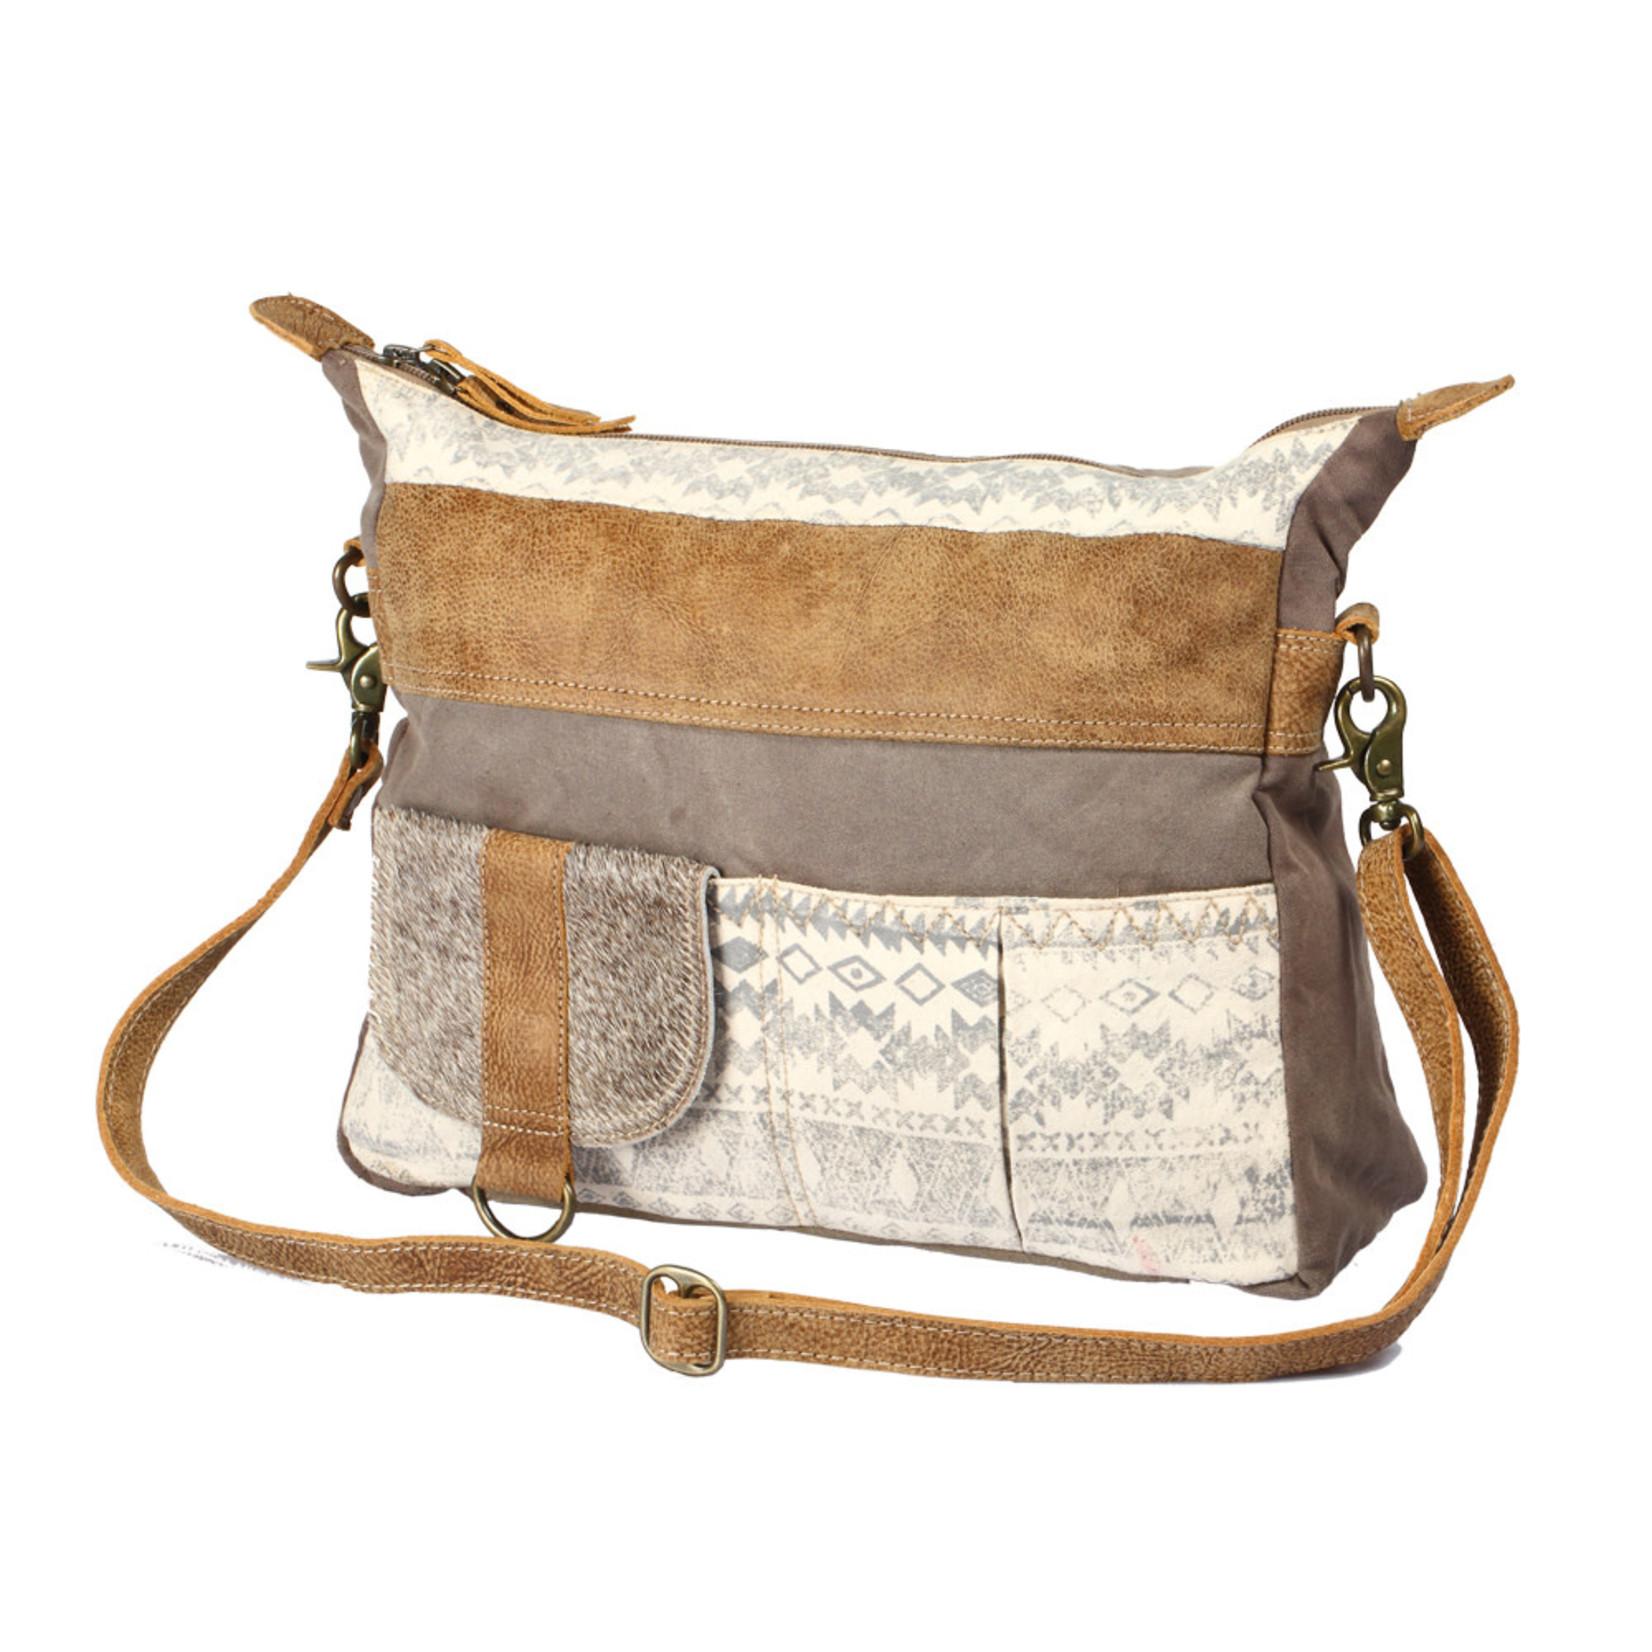 Myra Bags S-1210 Tribe Strip Shoulder Bag